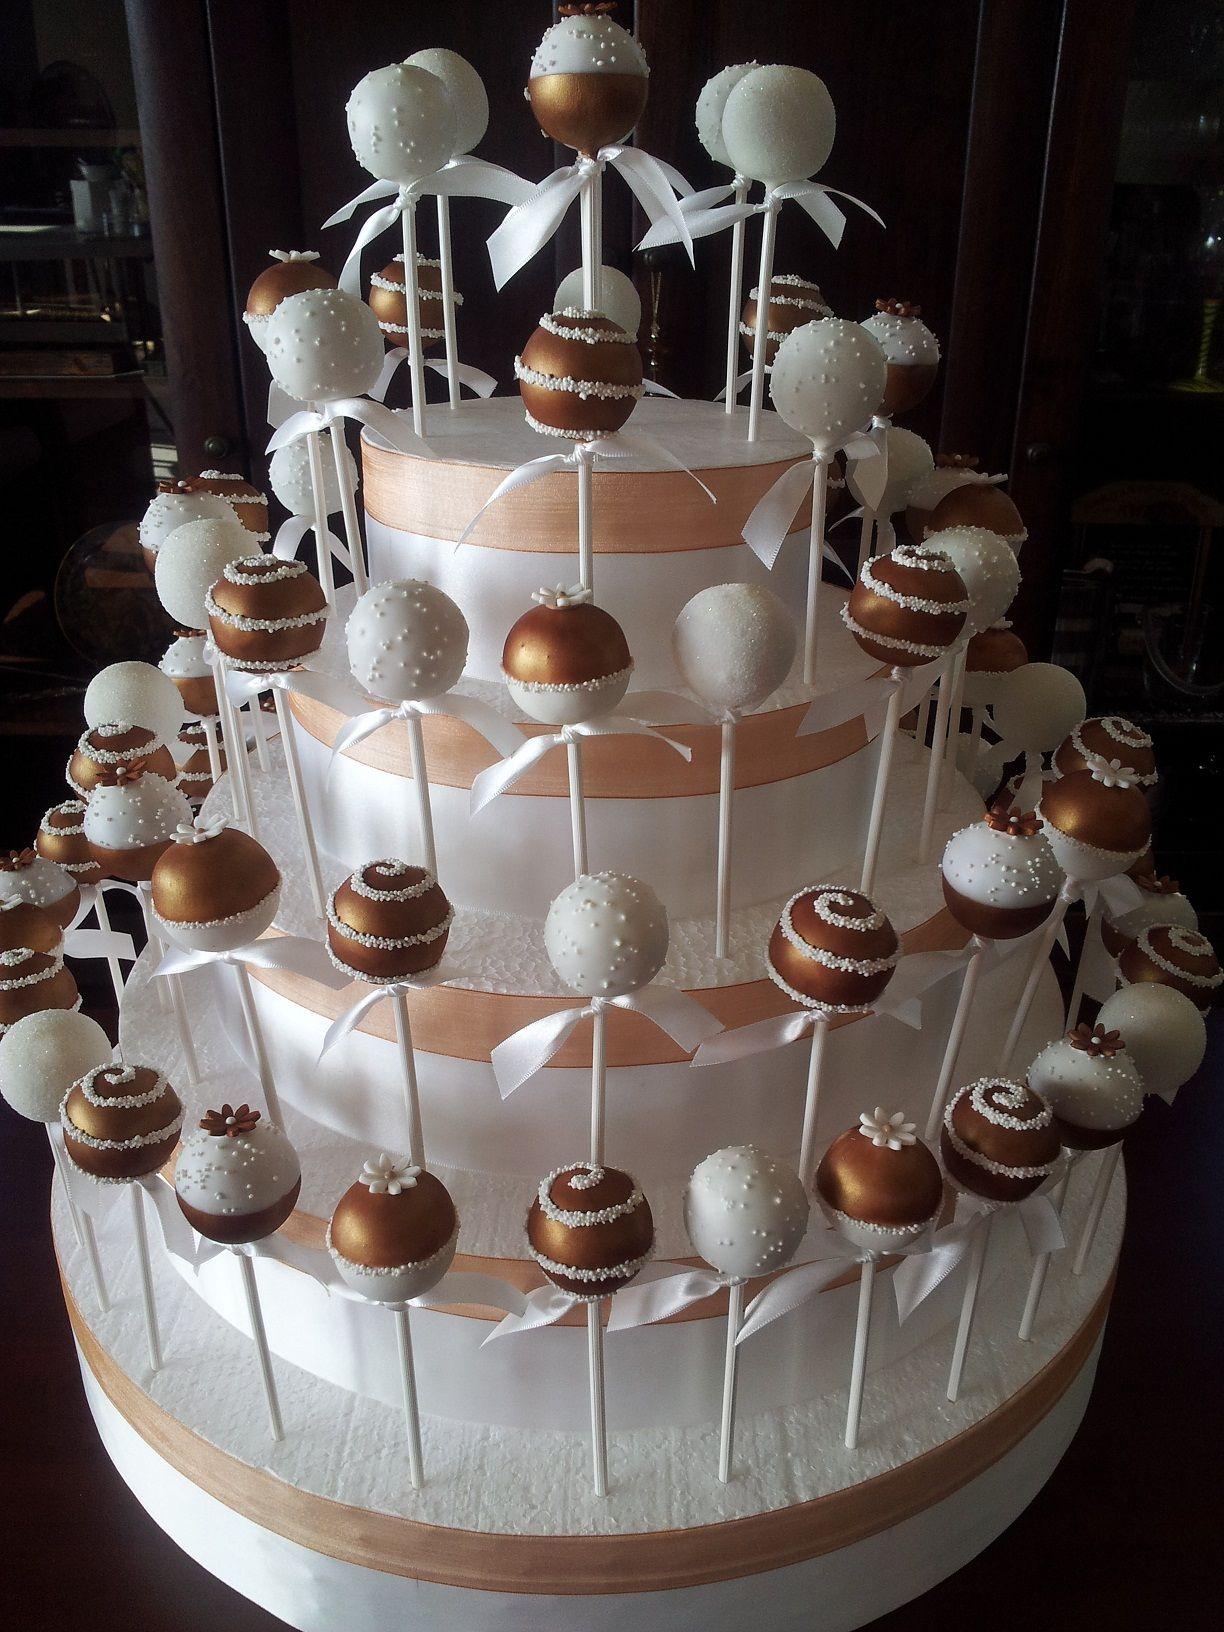 Bronze and white cake pops cake pop displays cake pop